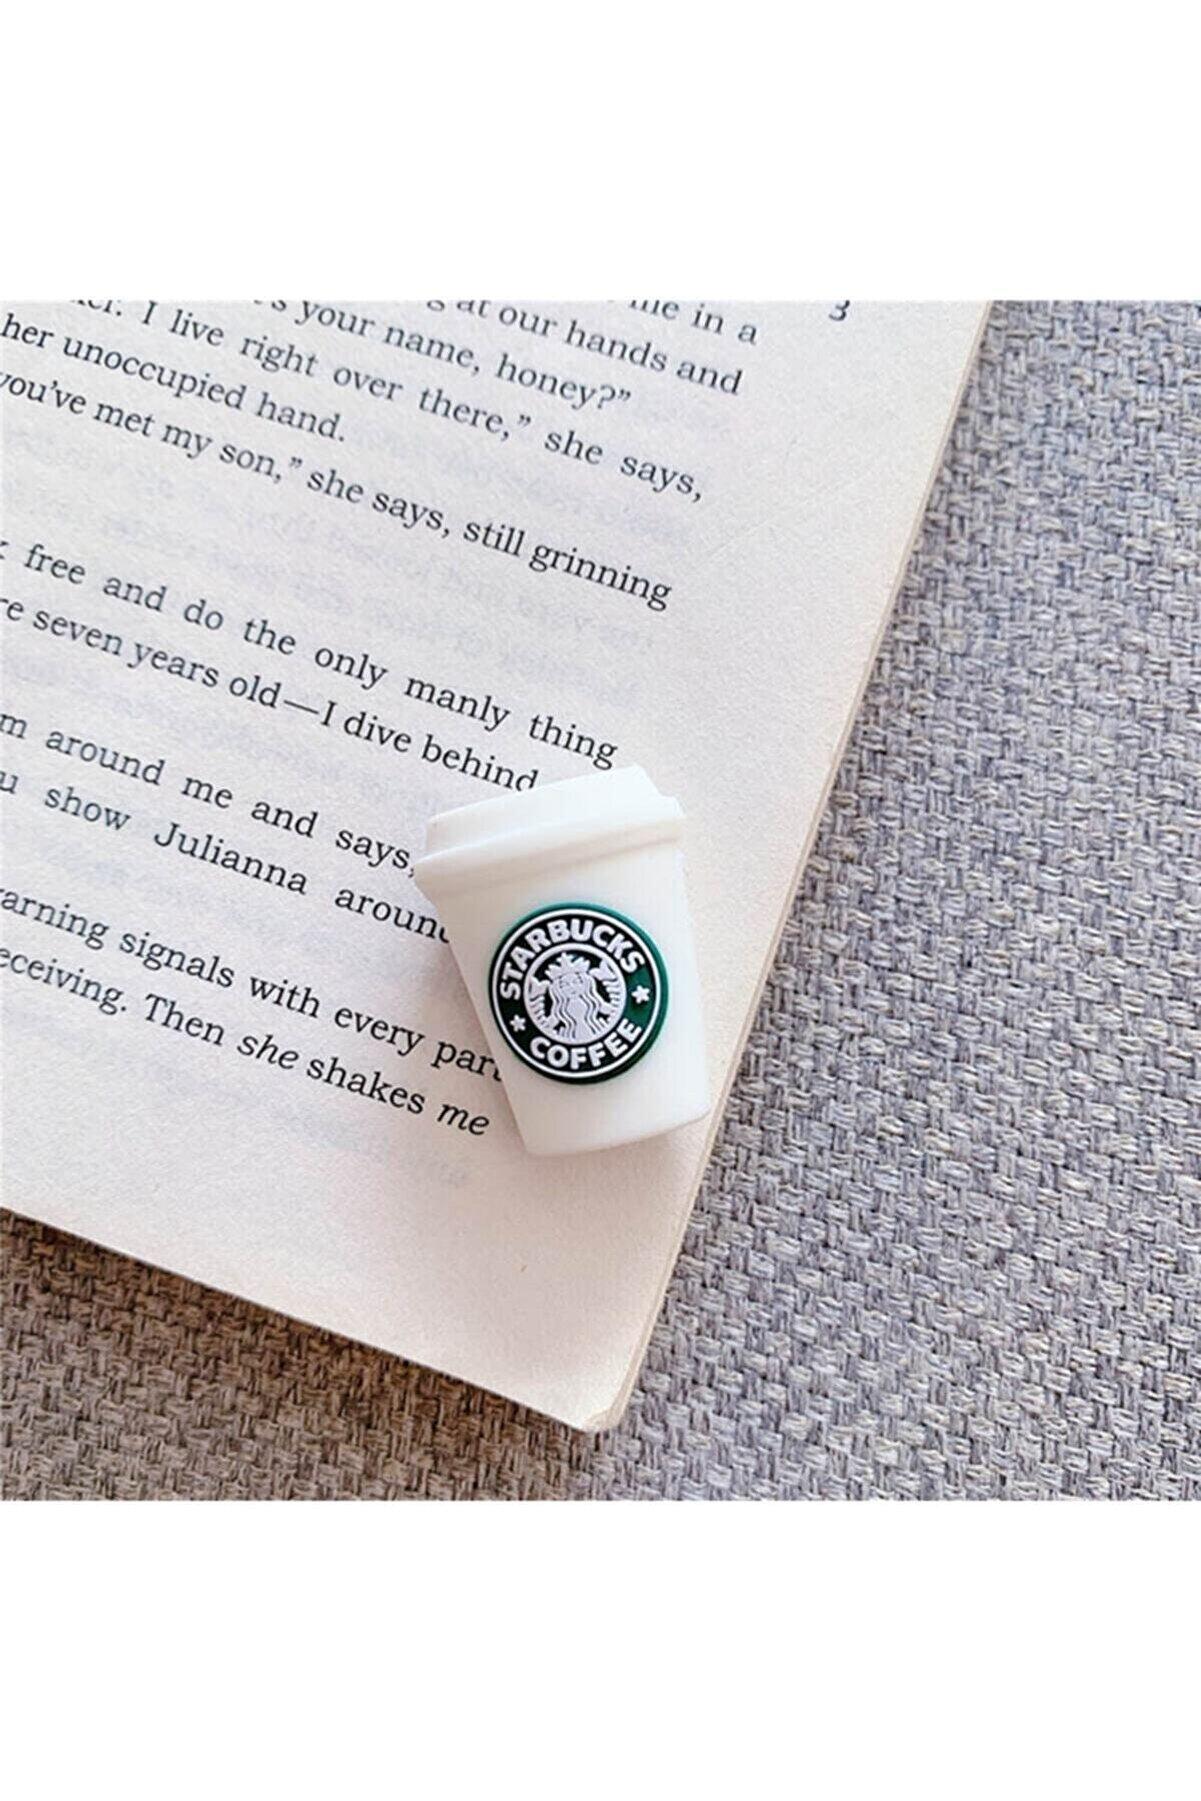 MY MÜRDÜM Sevimli Silikon Kablo Koruyucu Starbucks Kahve